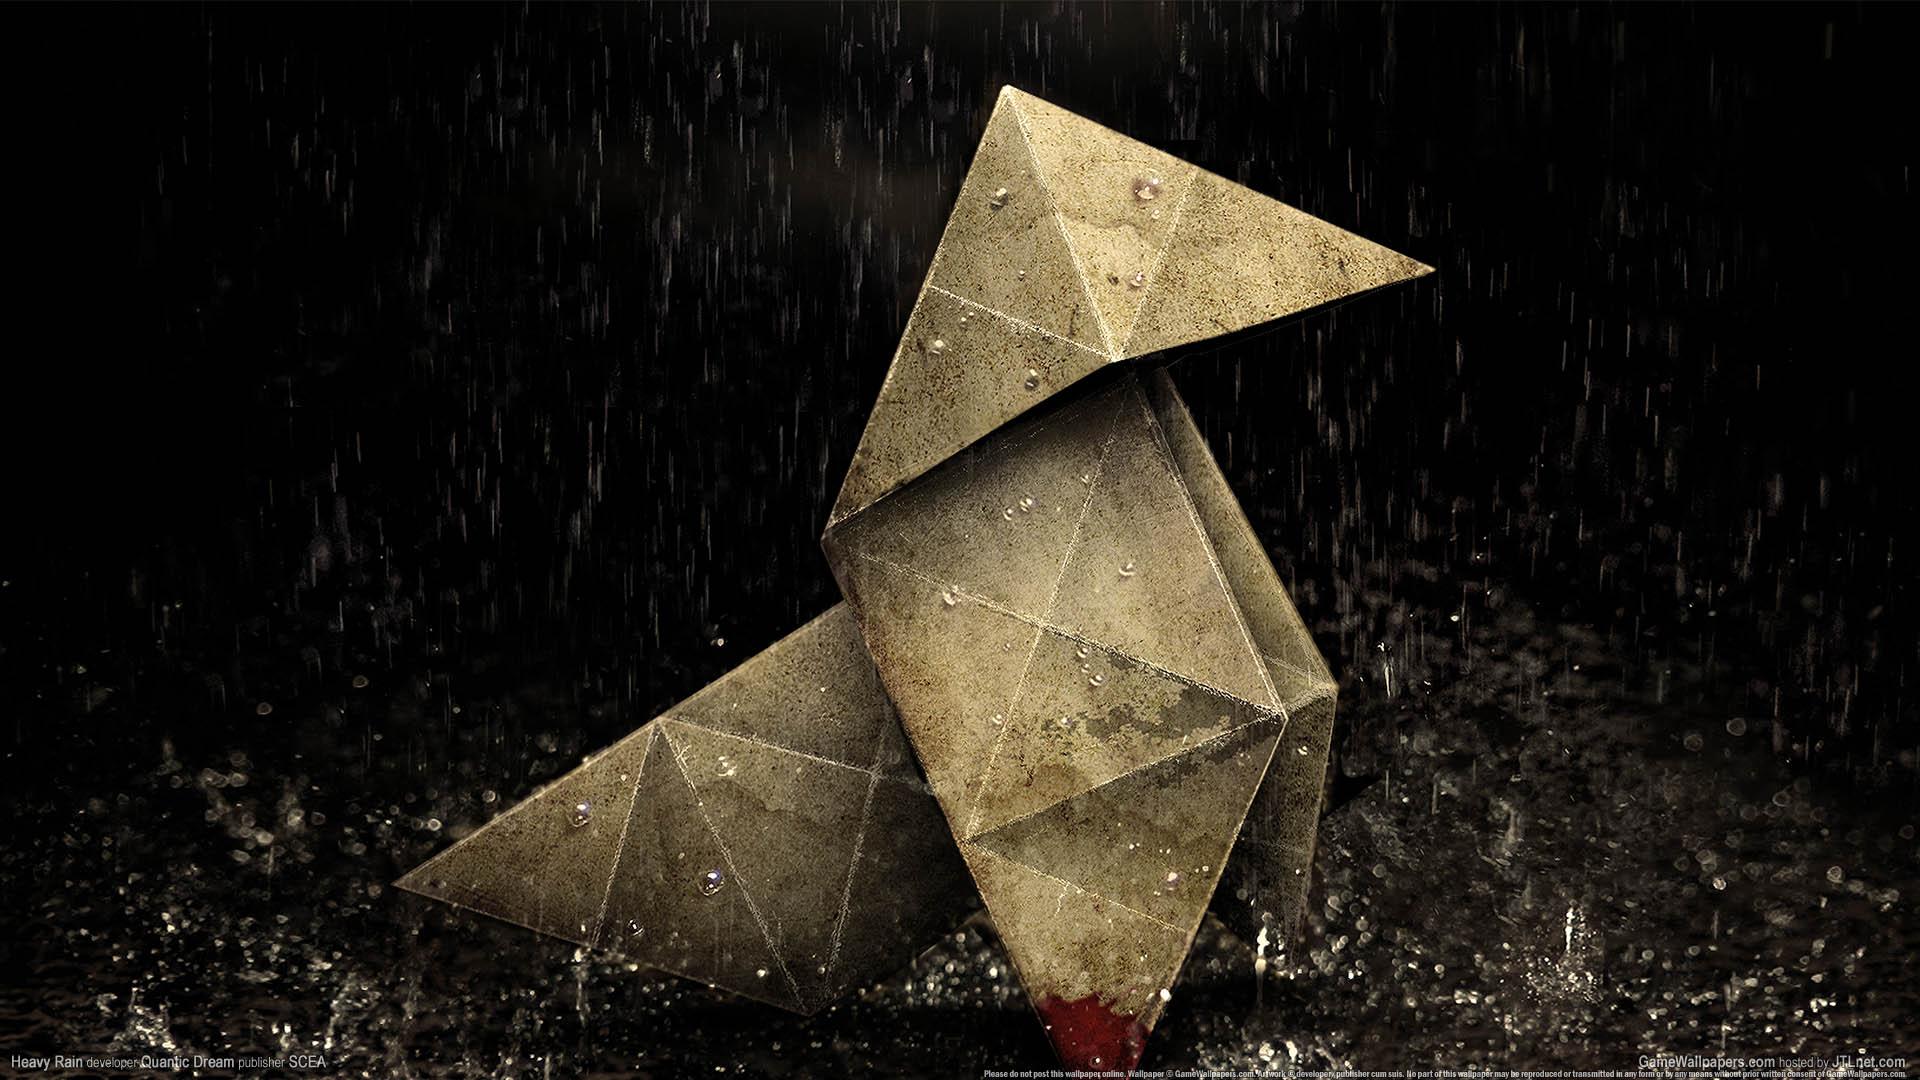 Heavy Rain fondo de escritorio 01 1920x1080